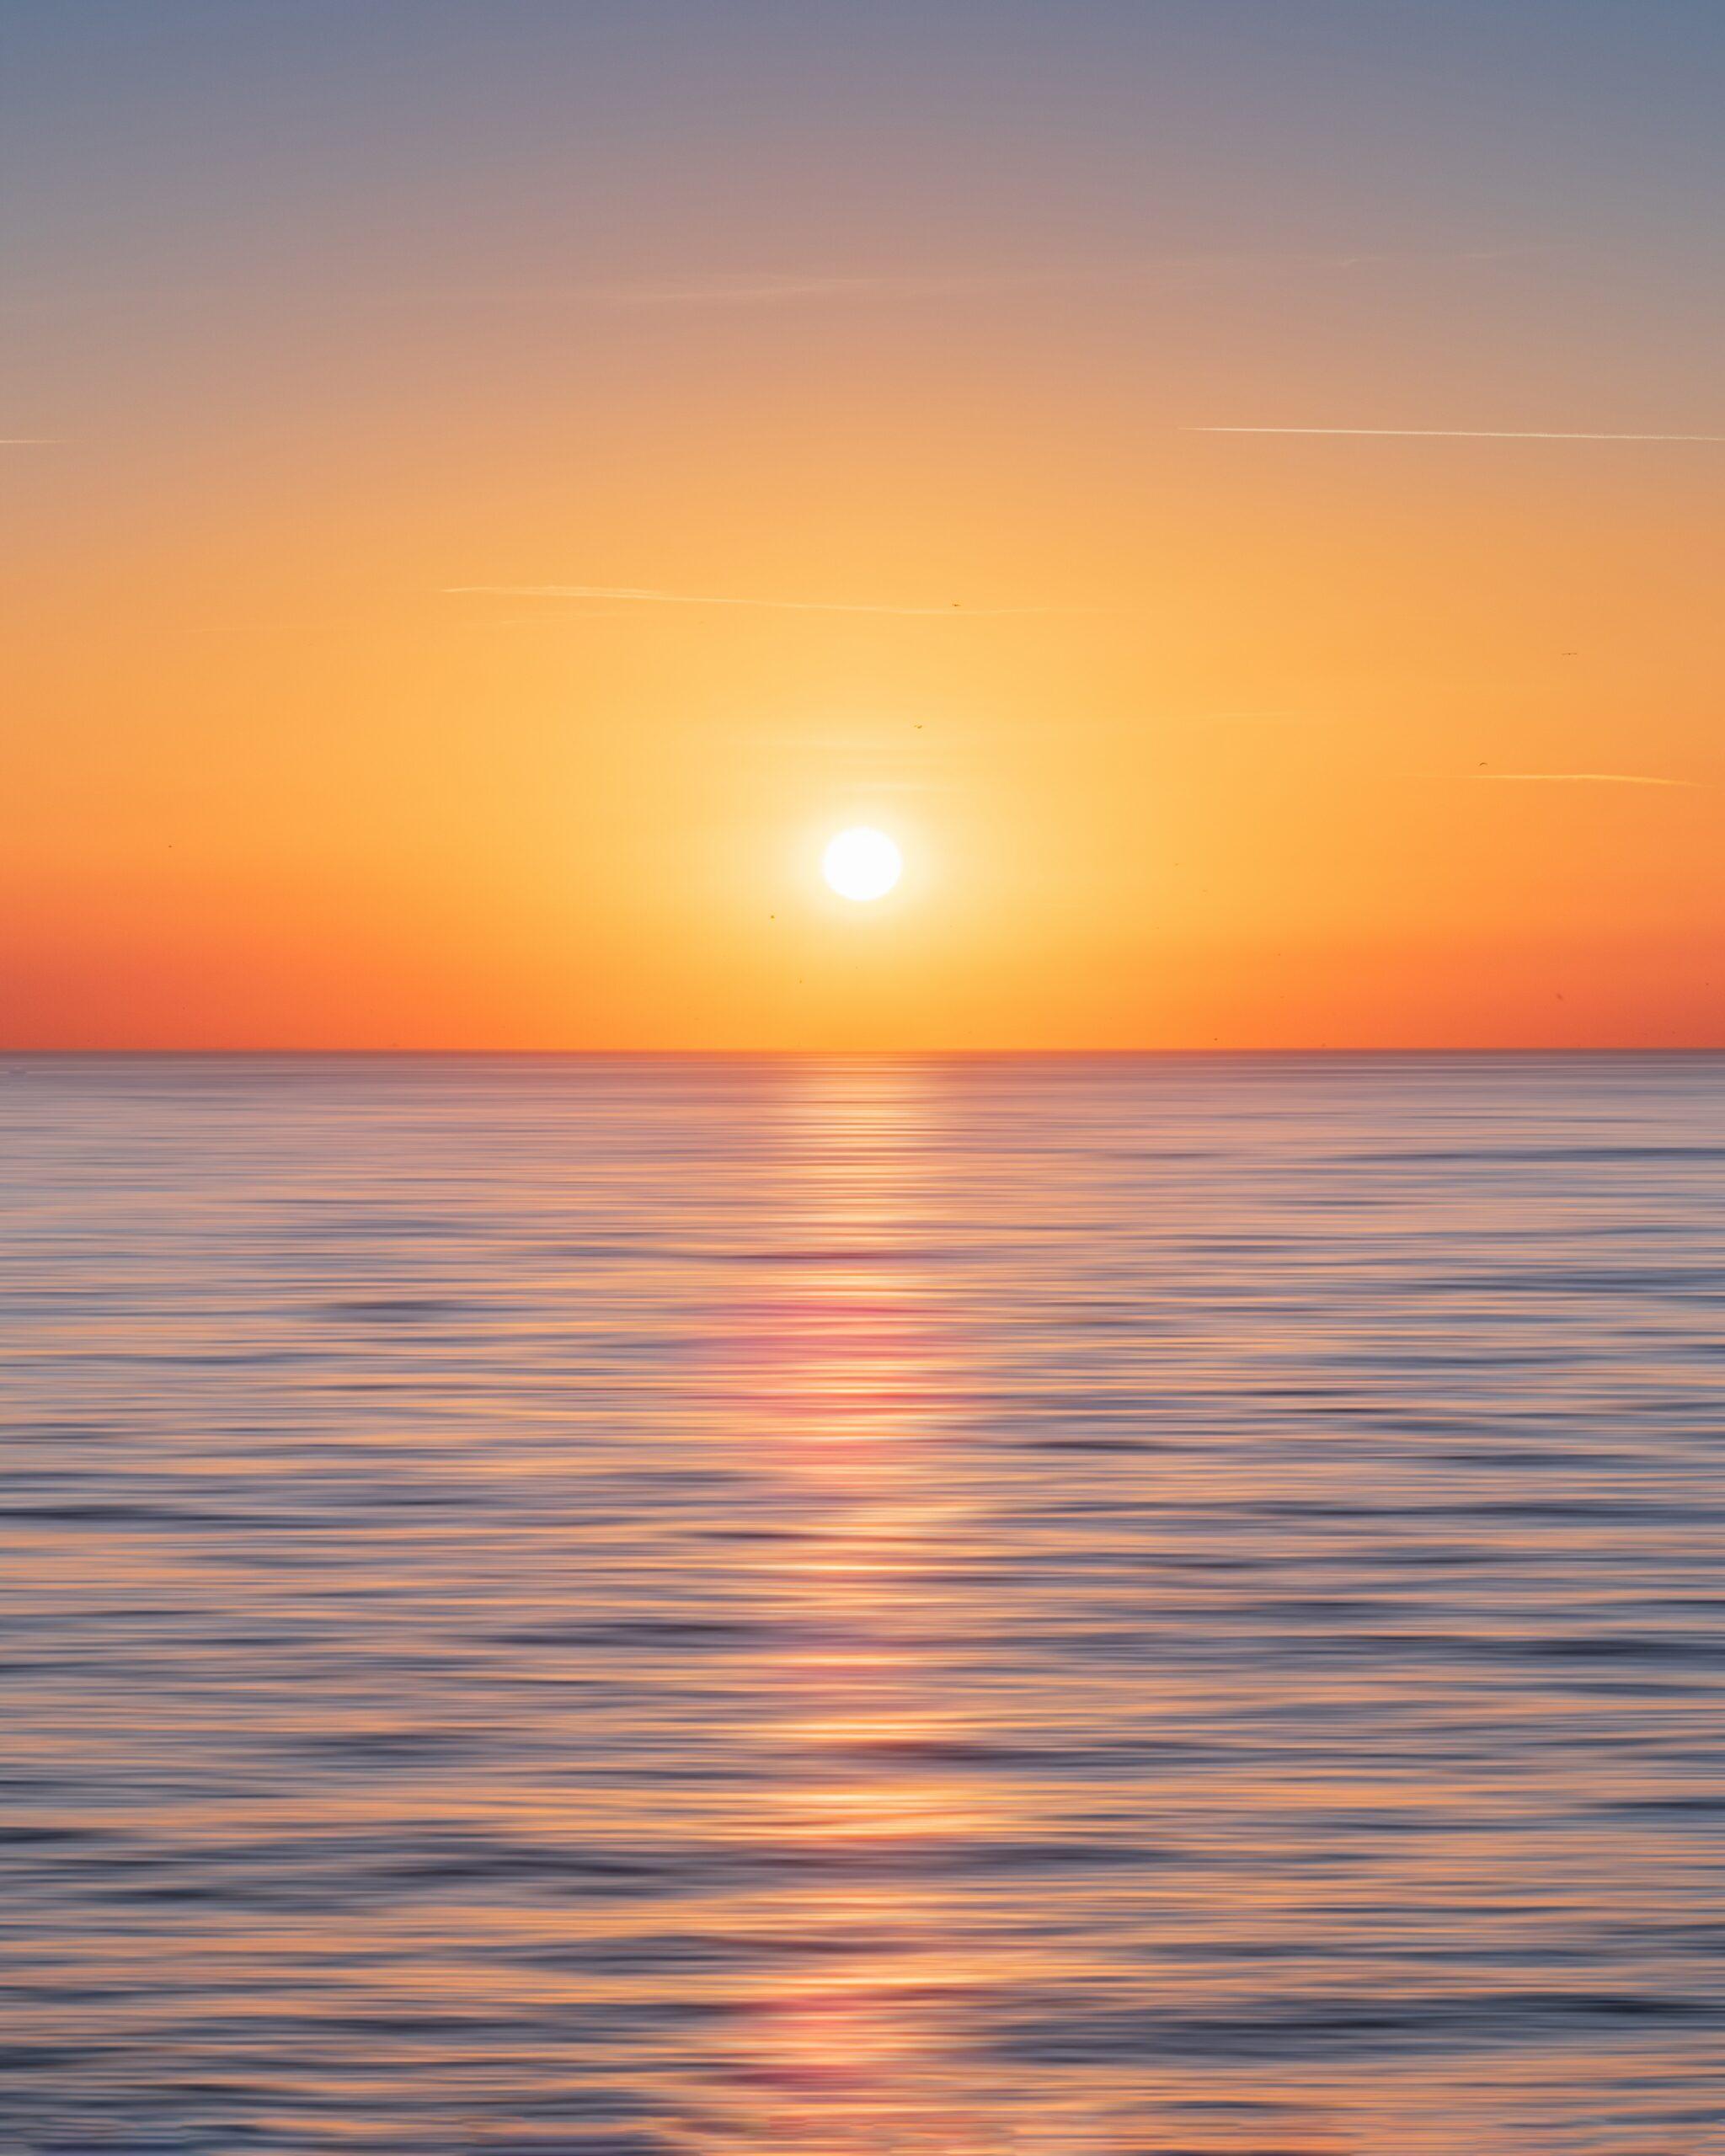 Sunset_pexels